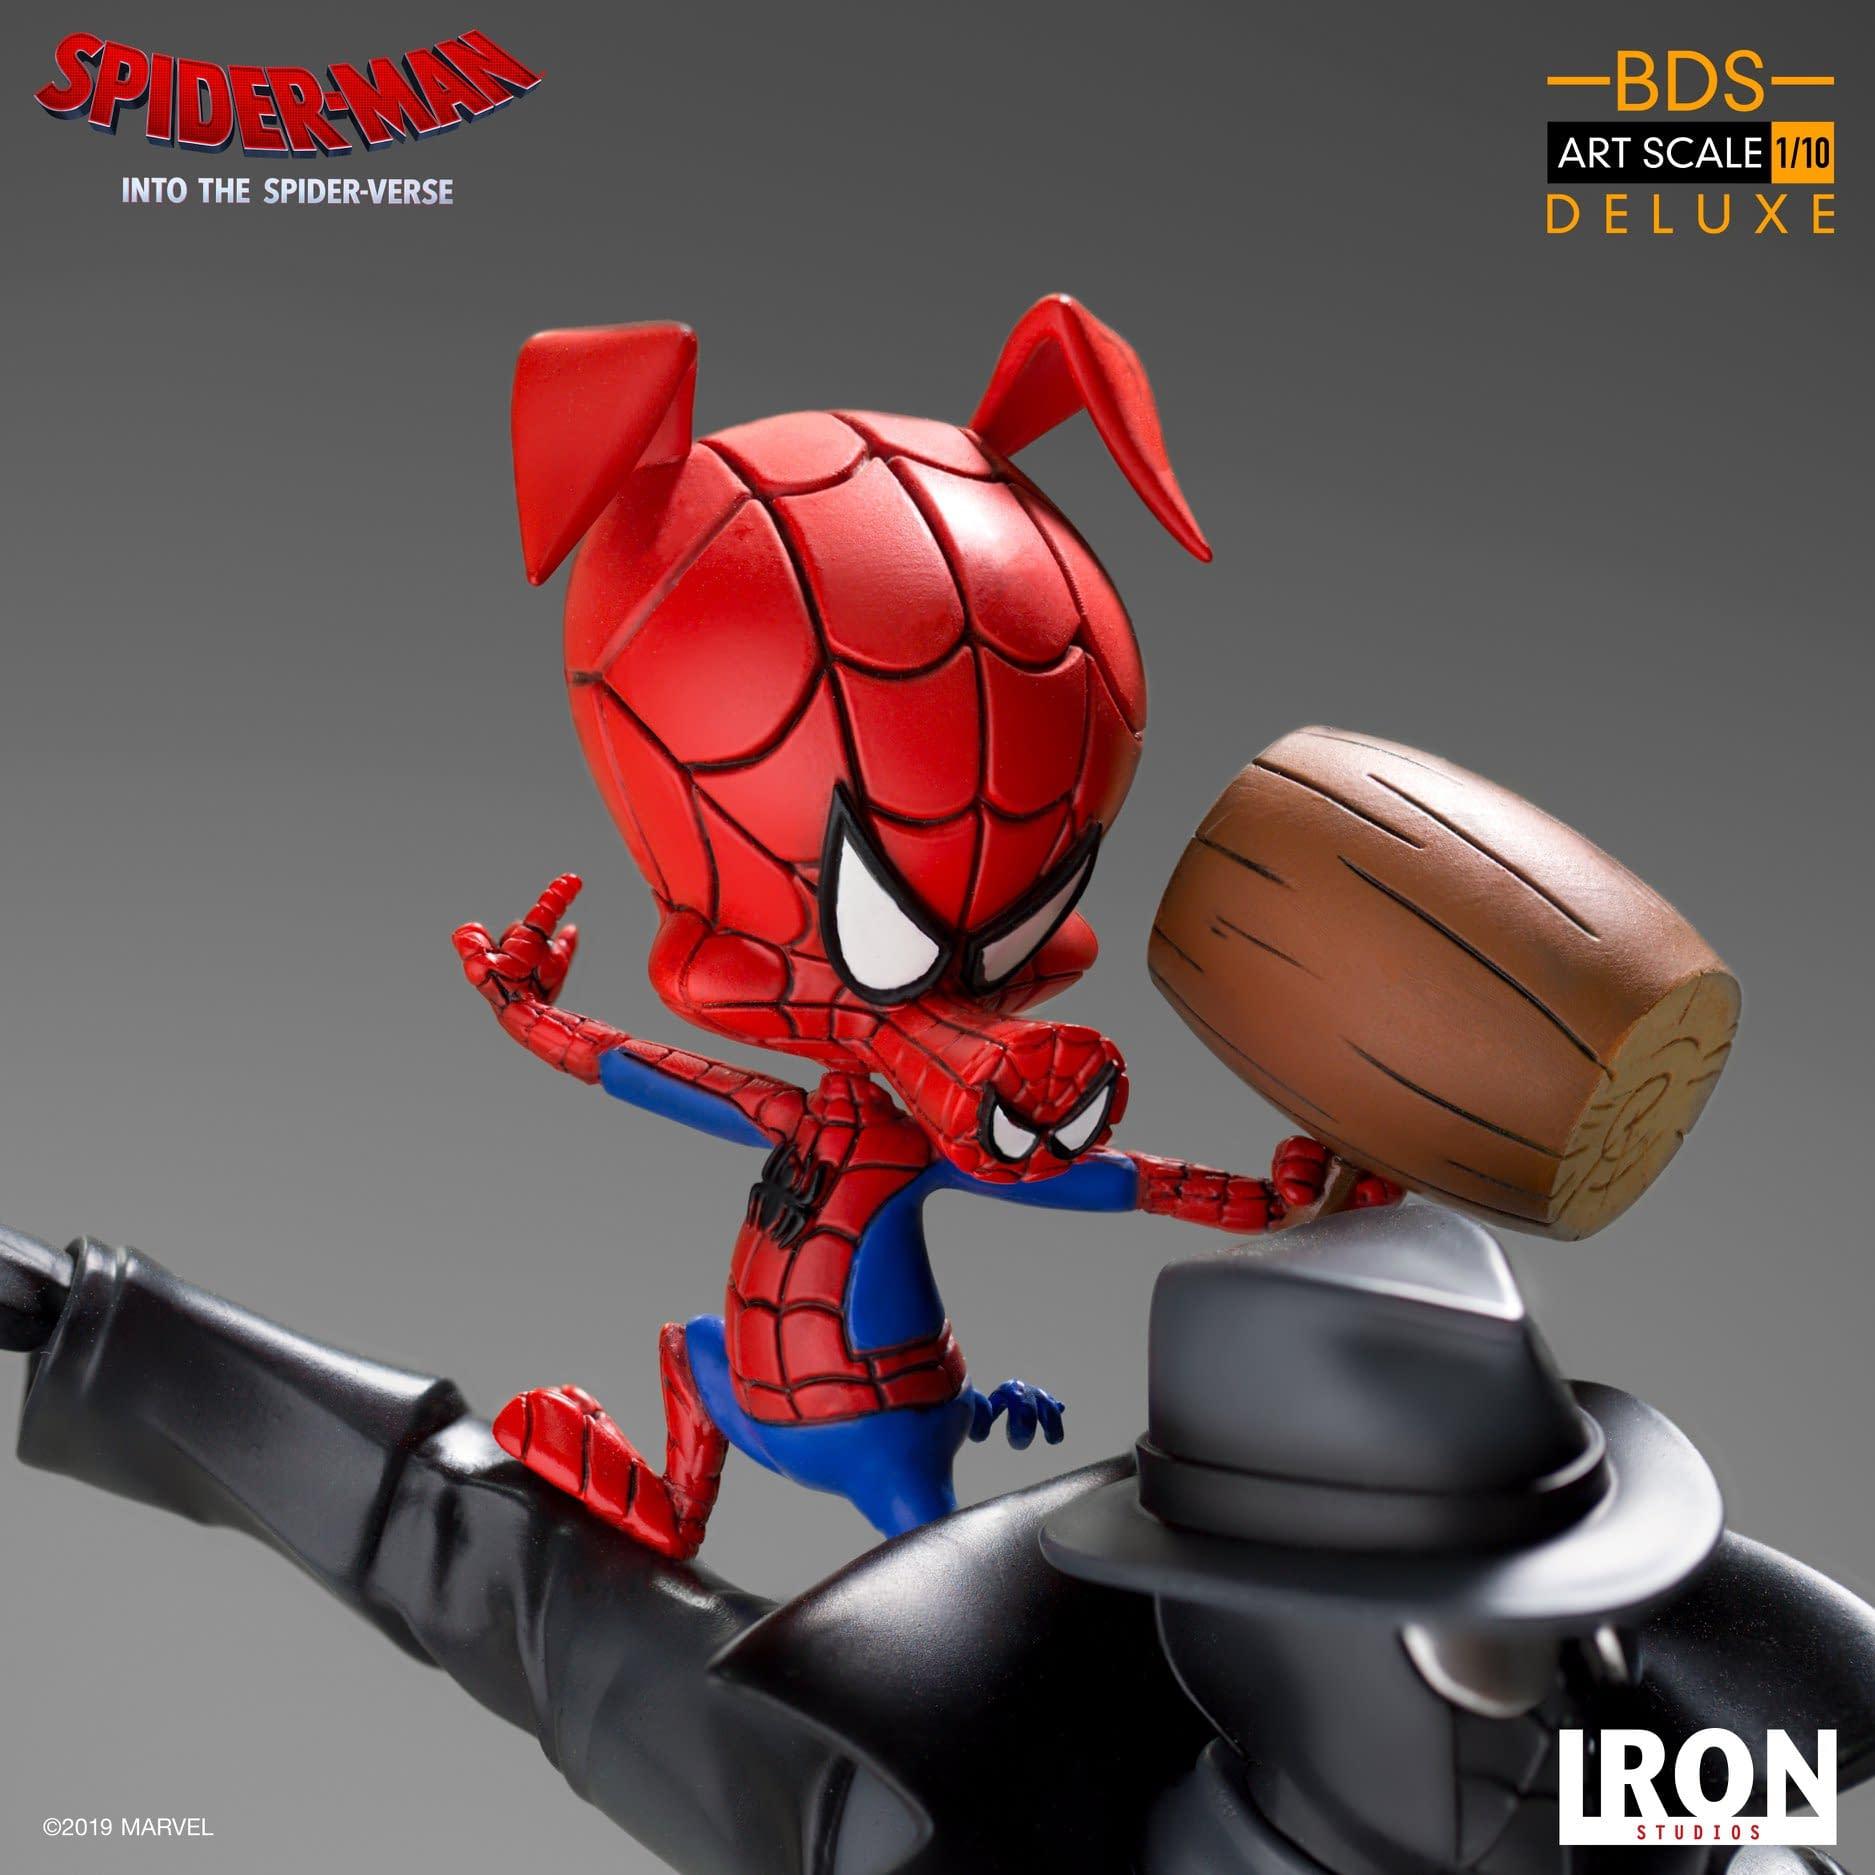 Noir Spider-Man Teams Up With Spider-Ham In Iron Studios Statue